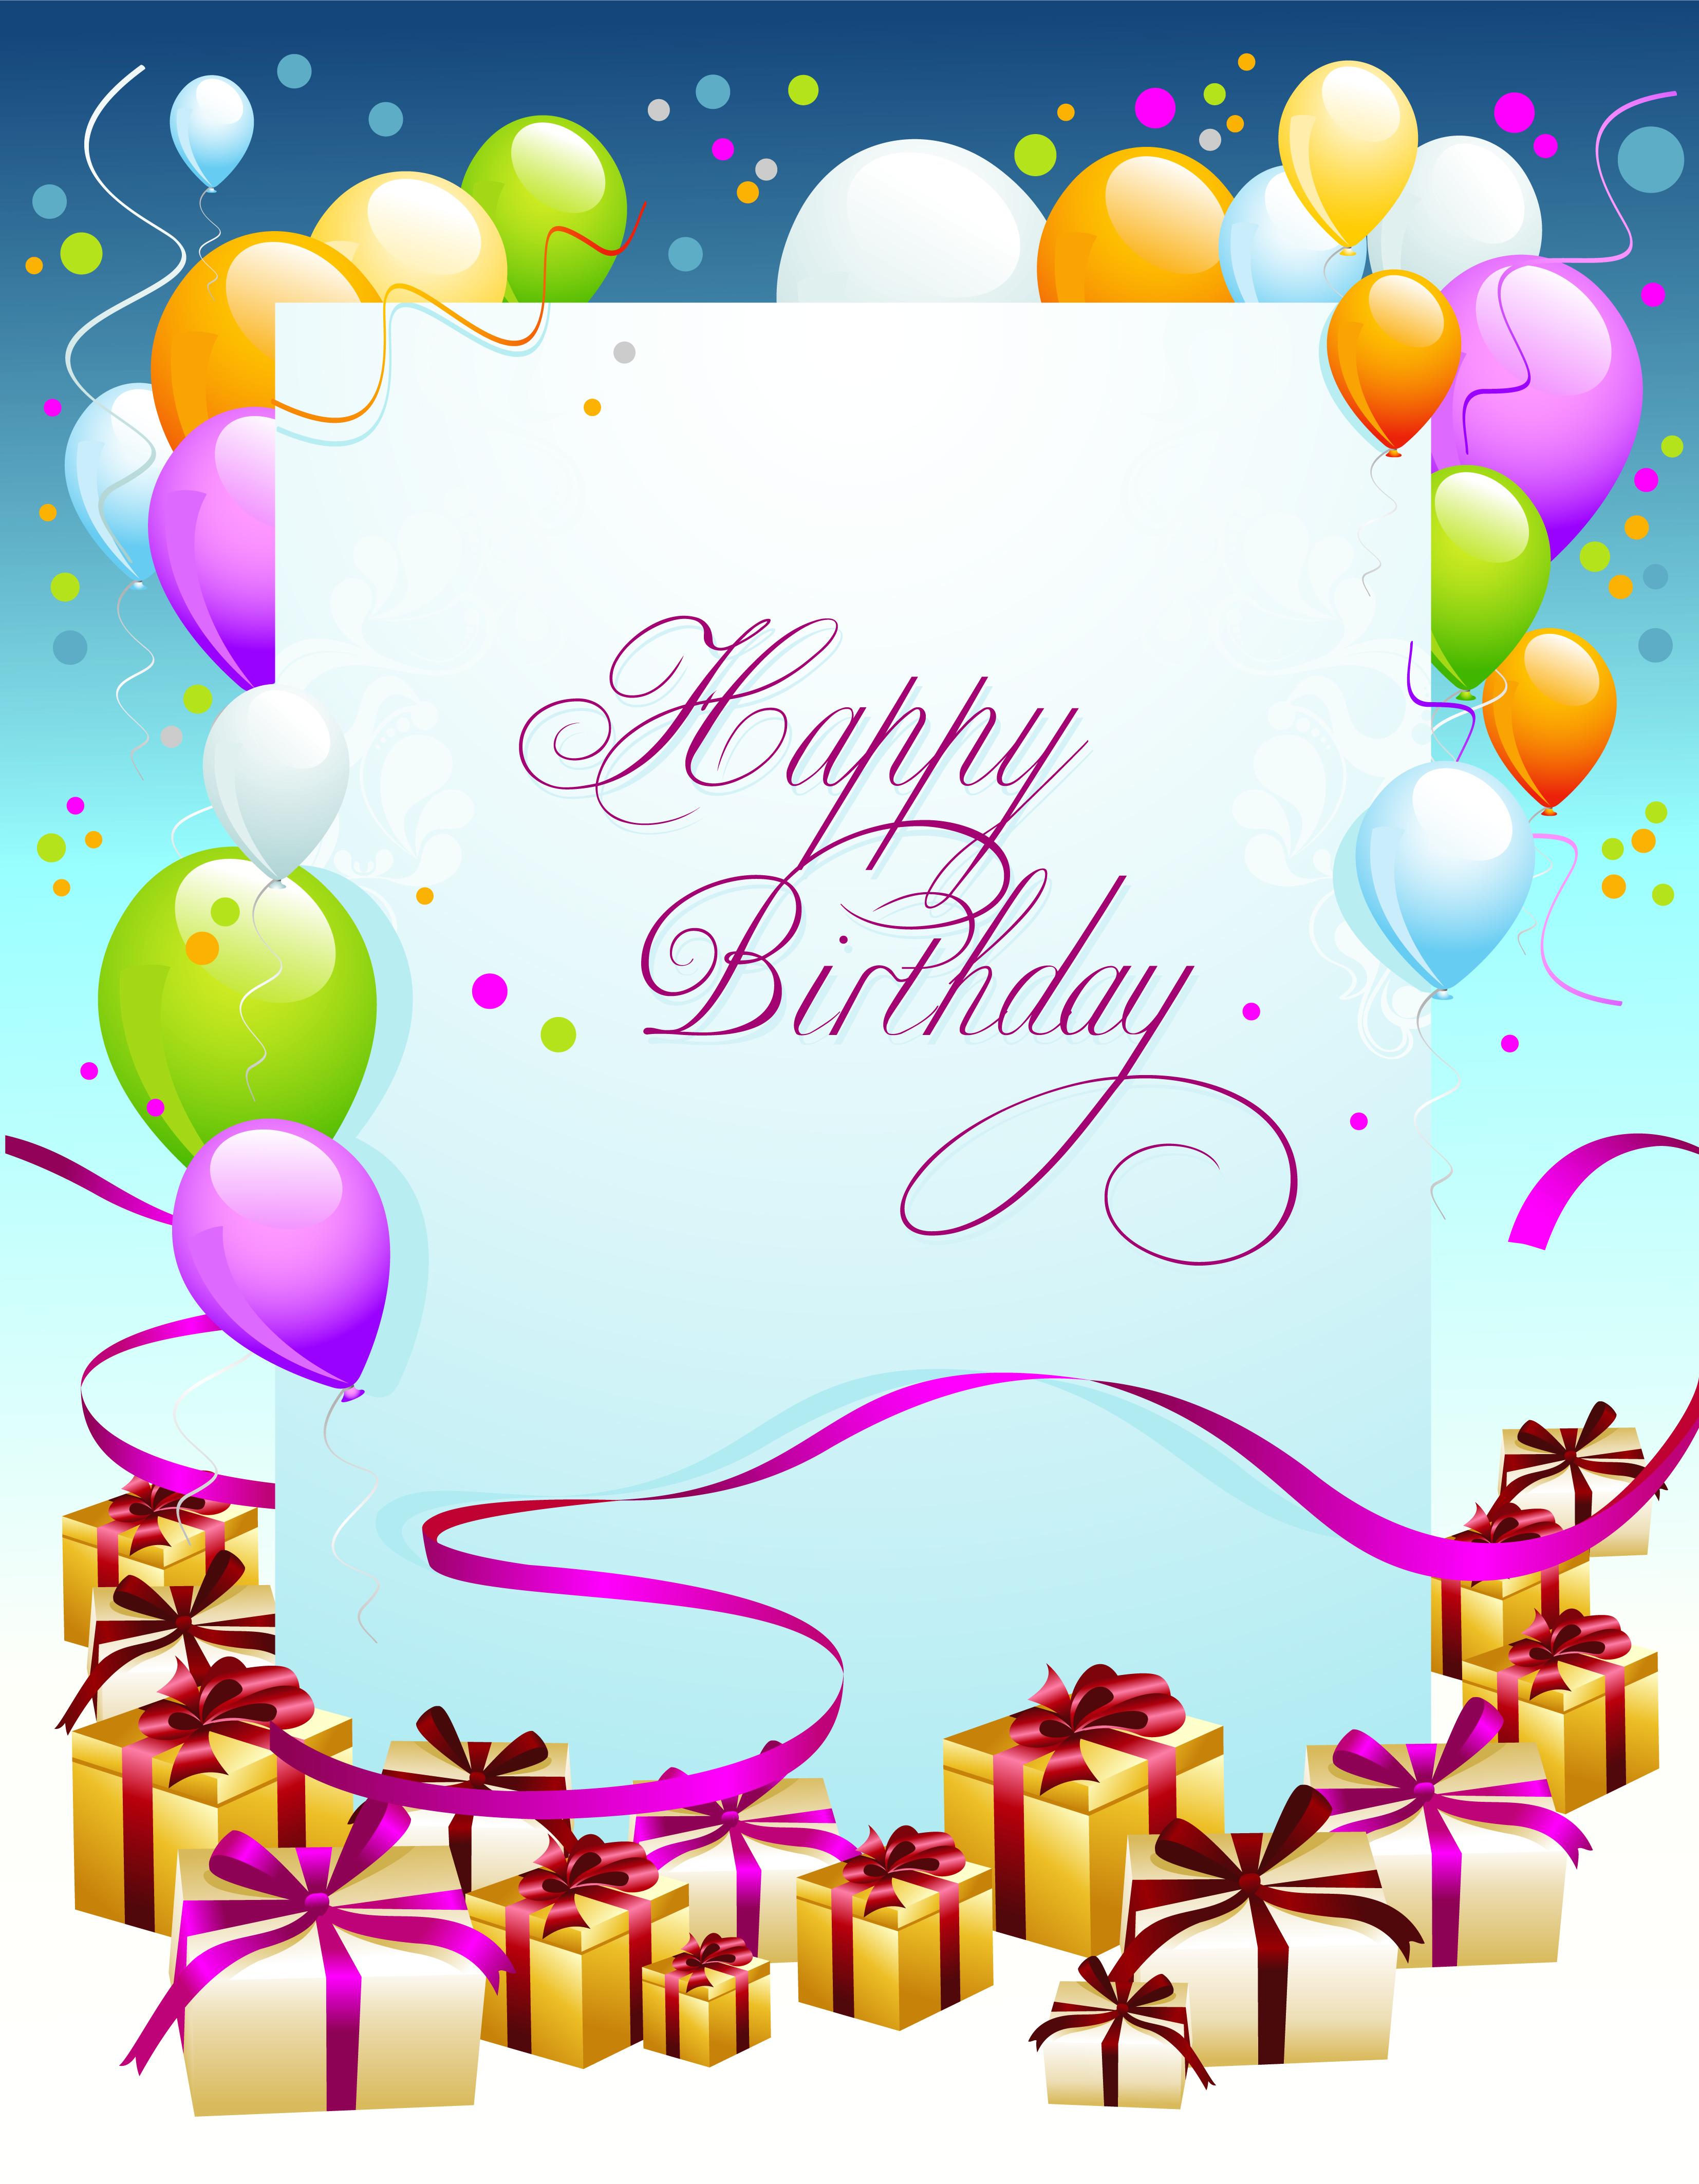 Free Free Happy Birthday Pics, Download Free Clip Art, Free Clip Art - Birthday Clipart Free Printable